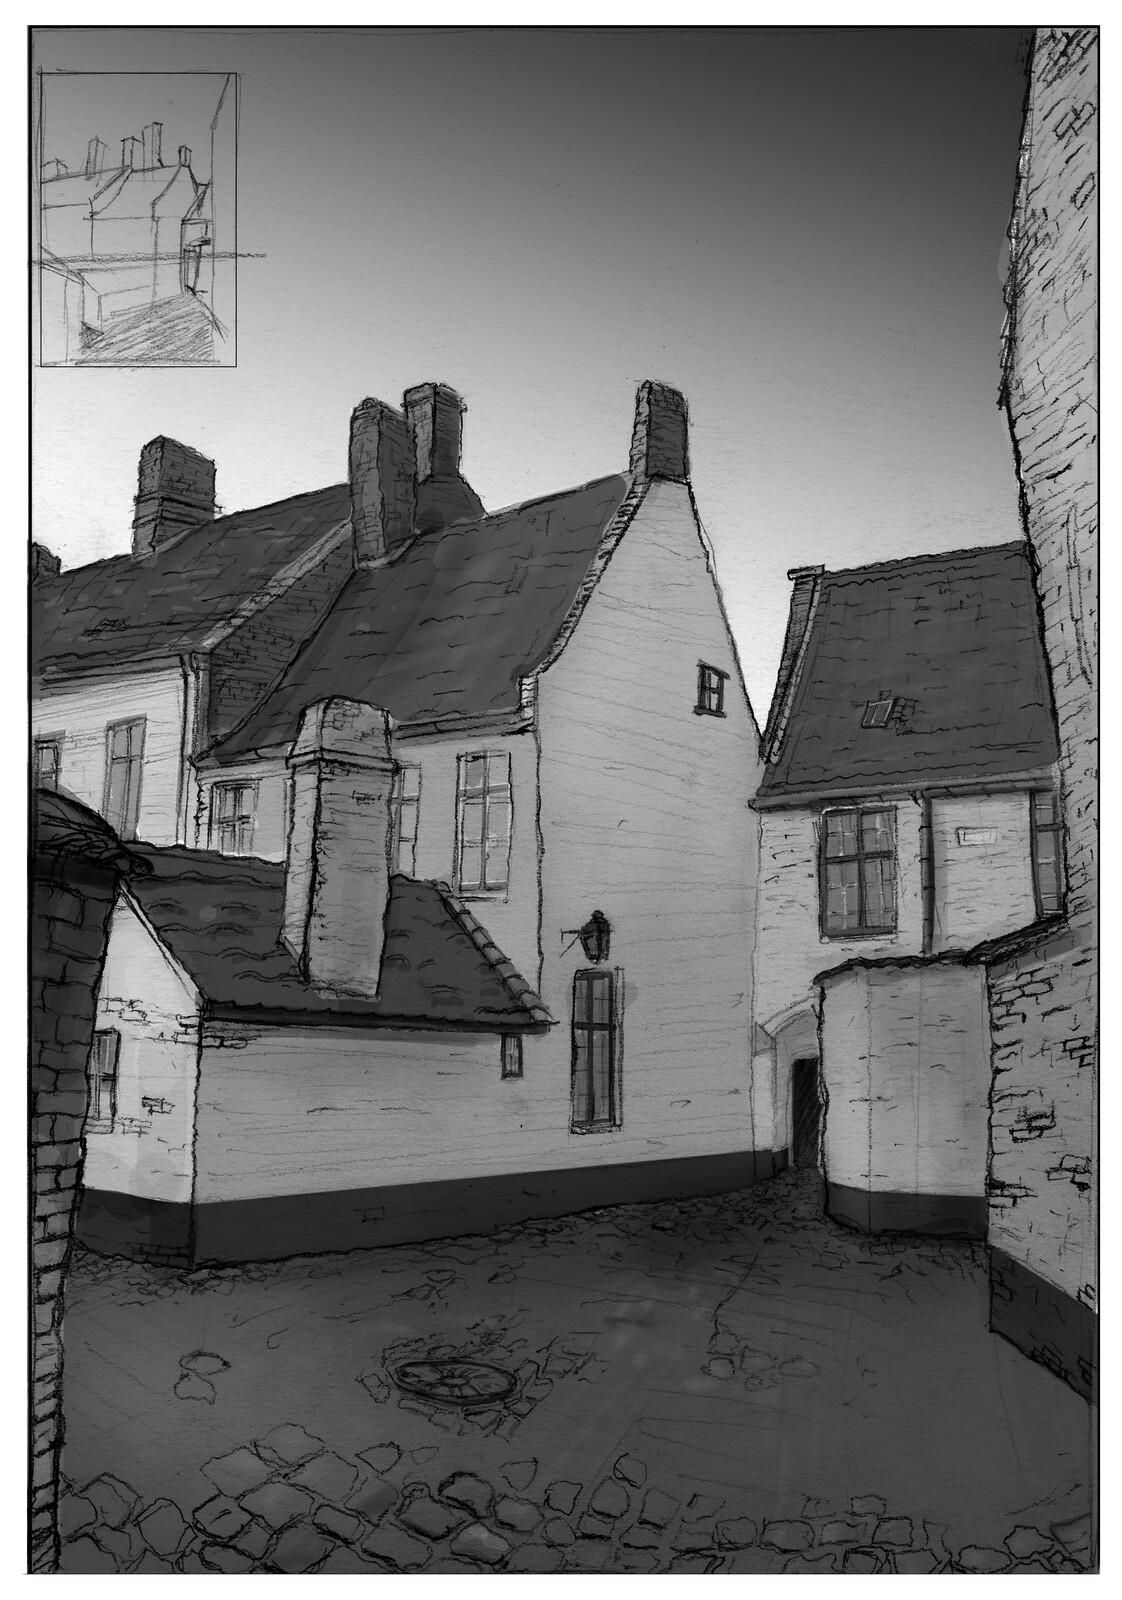 Sketchingtrip 2017